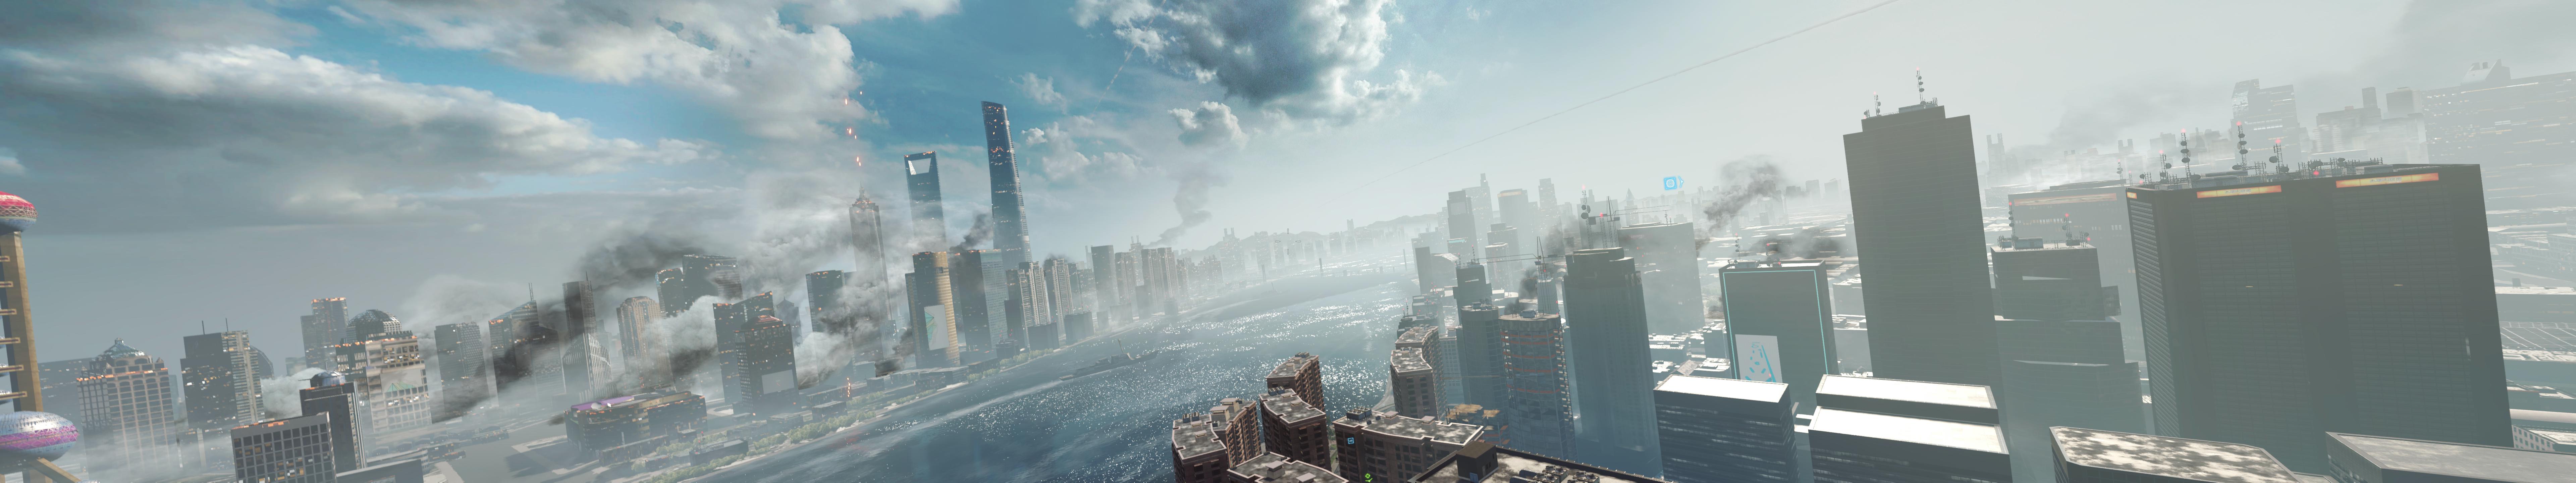 Battlefield 4 screenshots maxed settings at 7680x1440 on LPC   PC 7680x1440